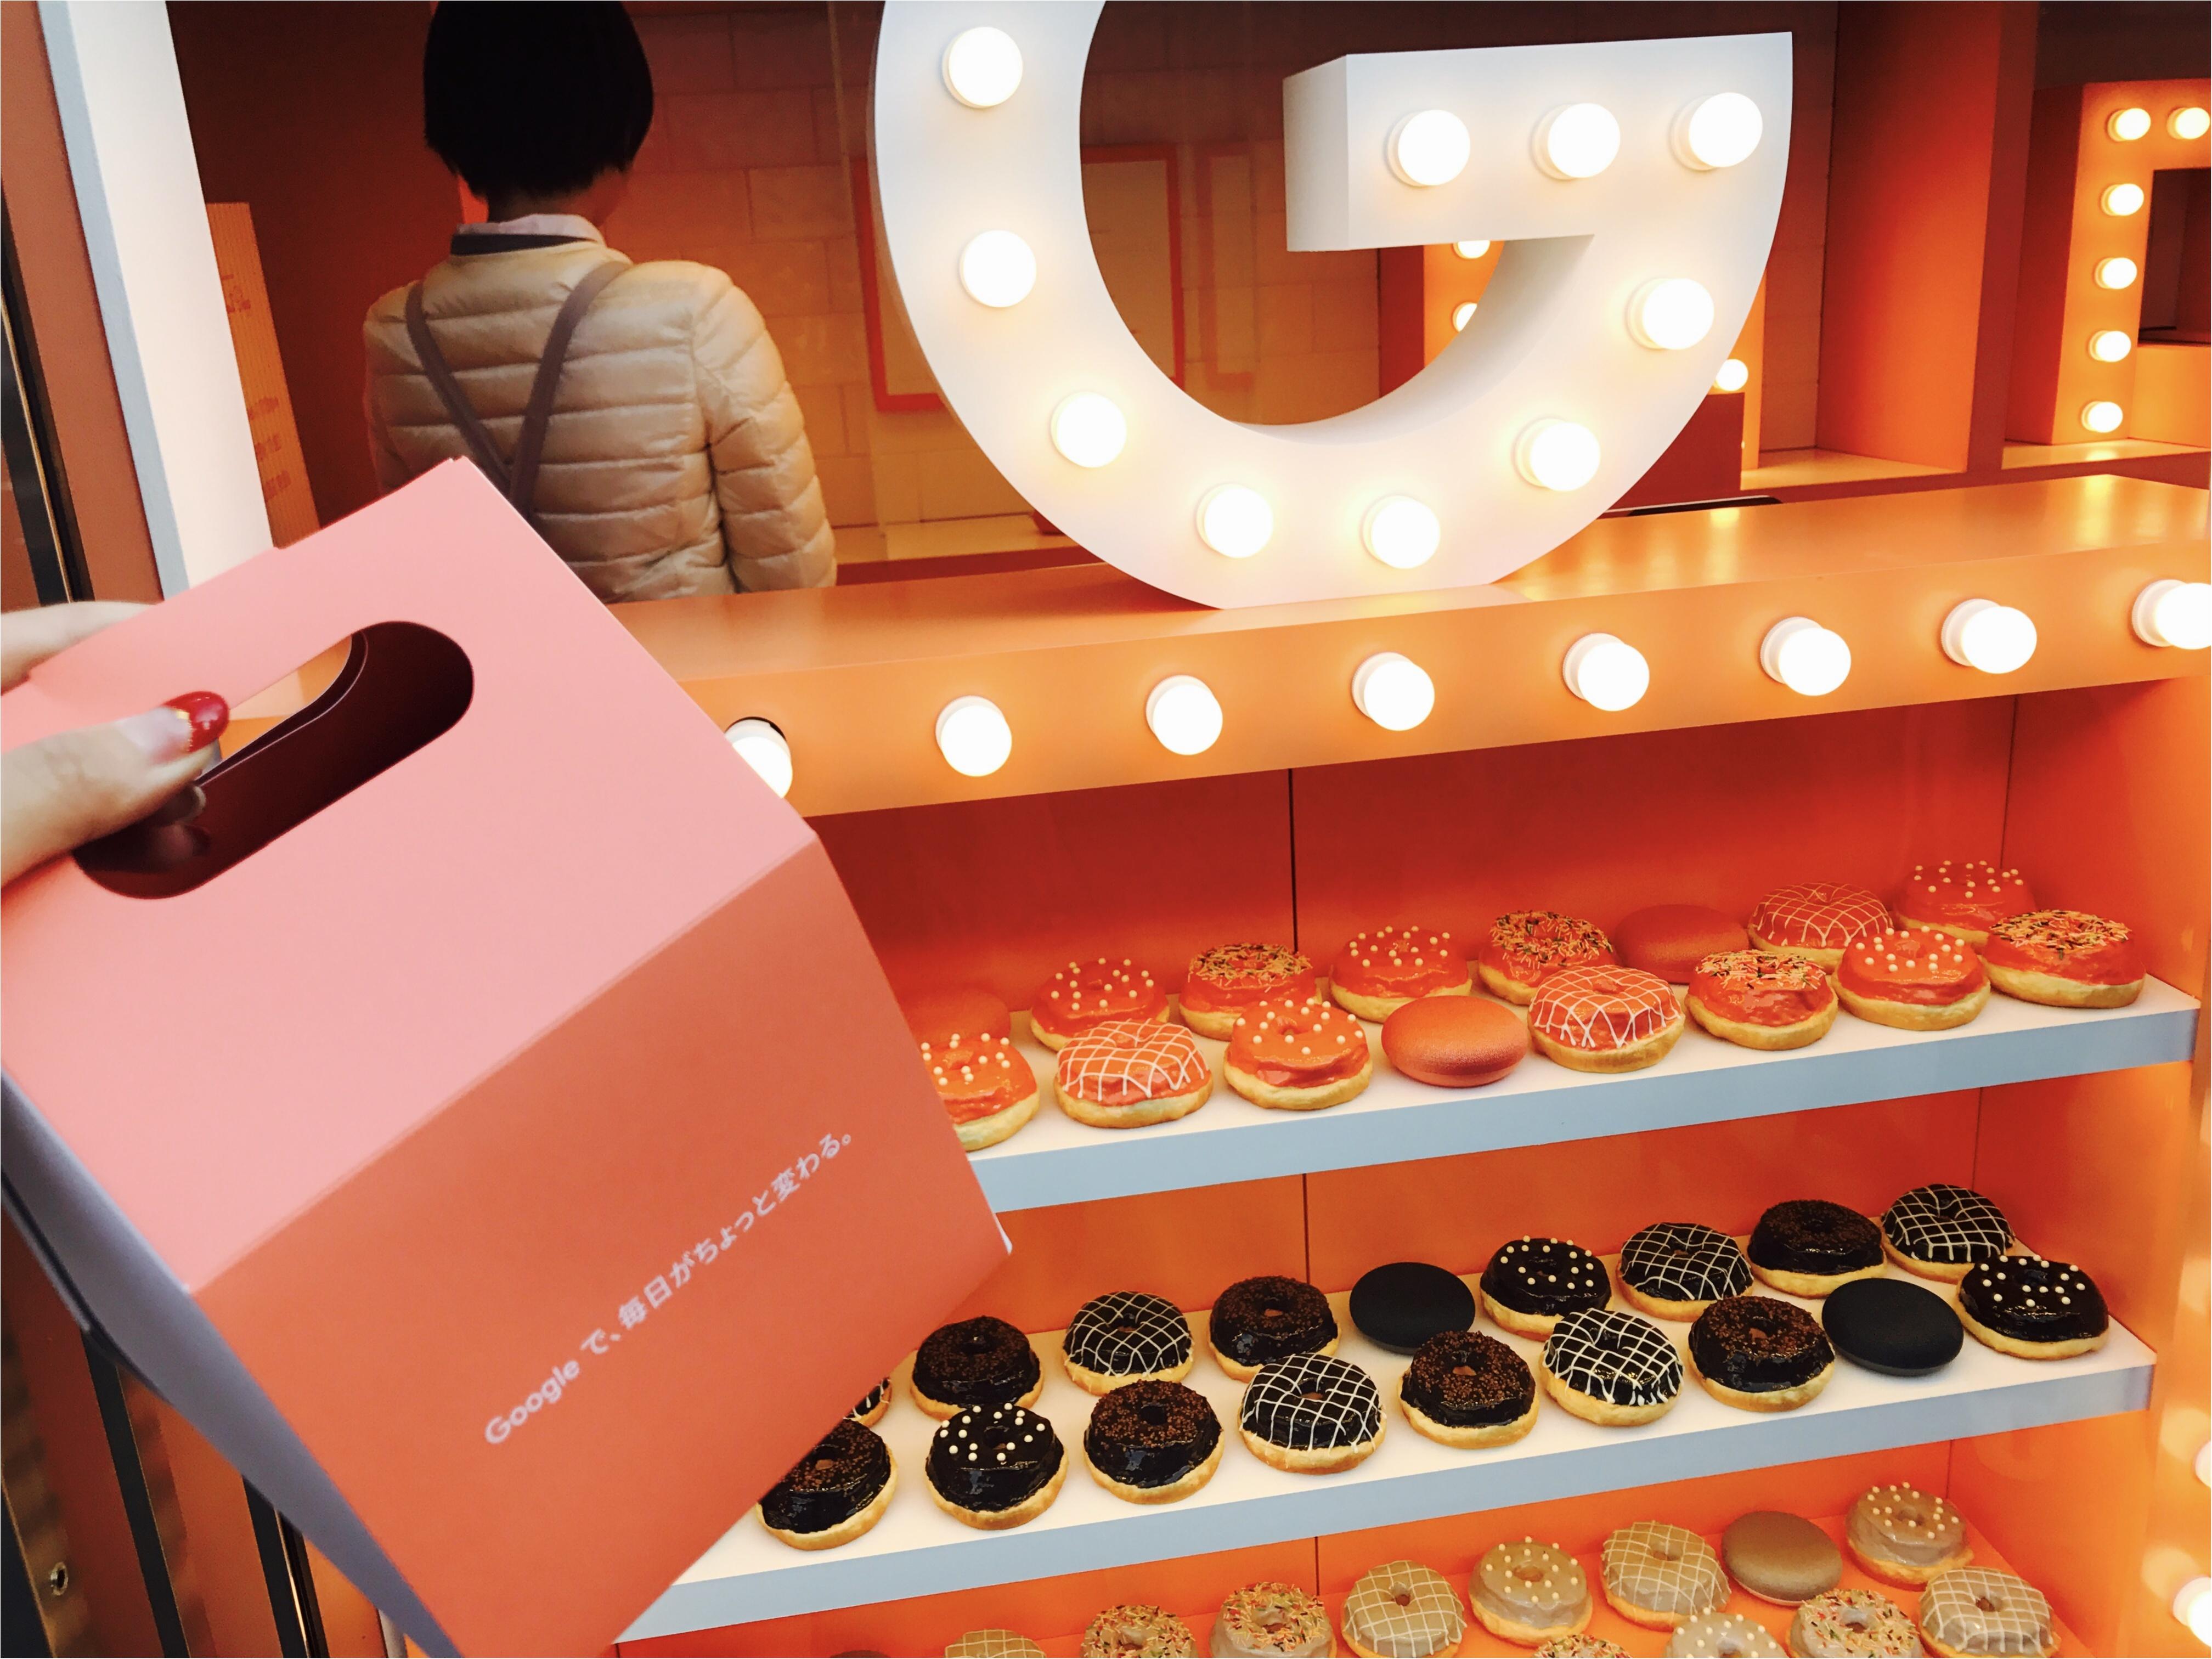 【Google Home Mini ドーナツショップ】《無料!》でドーナツもらえちゃいます!!運が良かったら本物の「Google Home Mini」が当たるかも!?_11